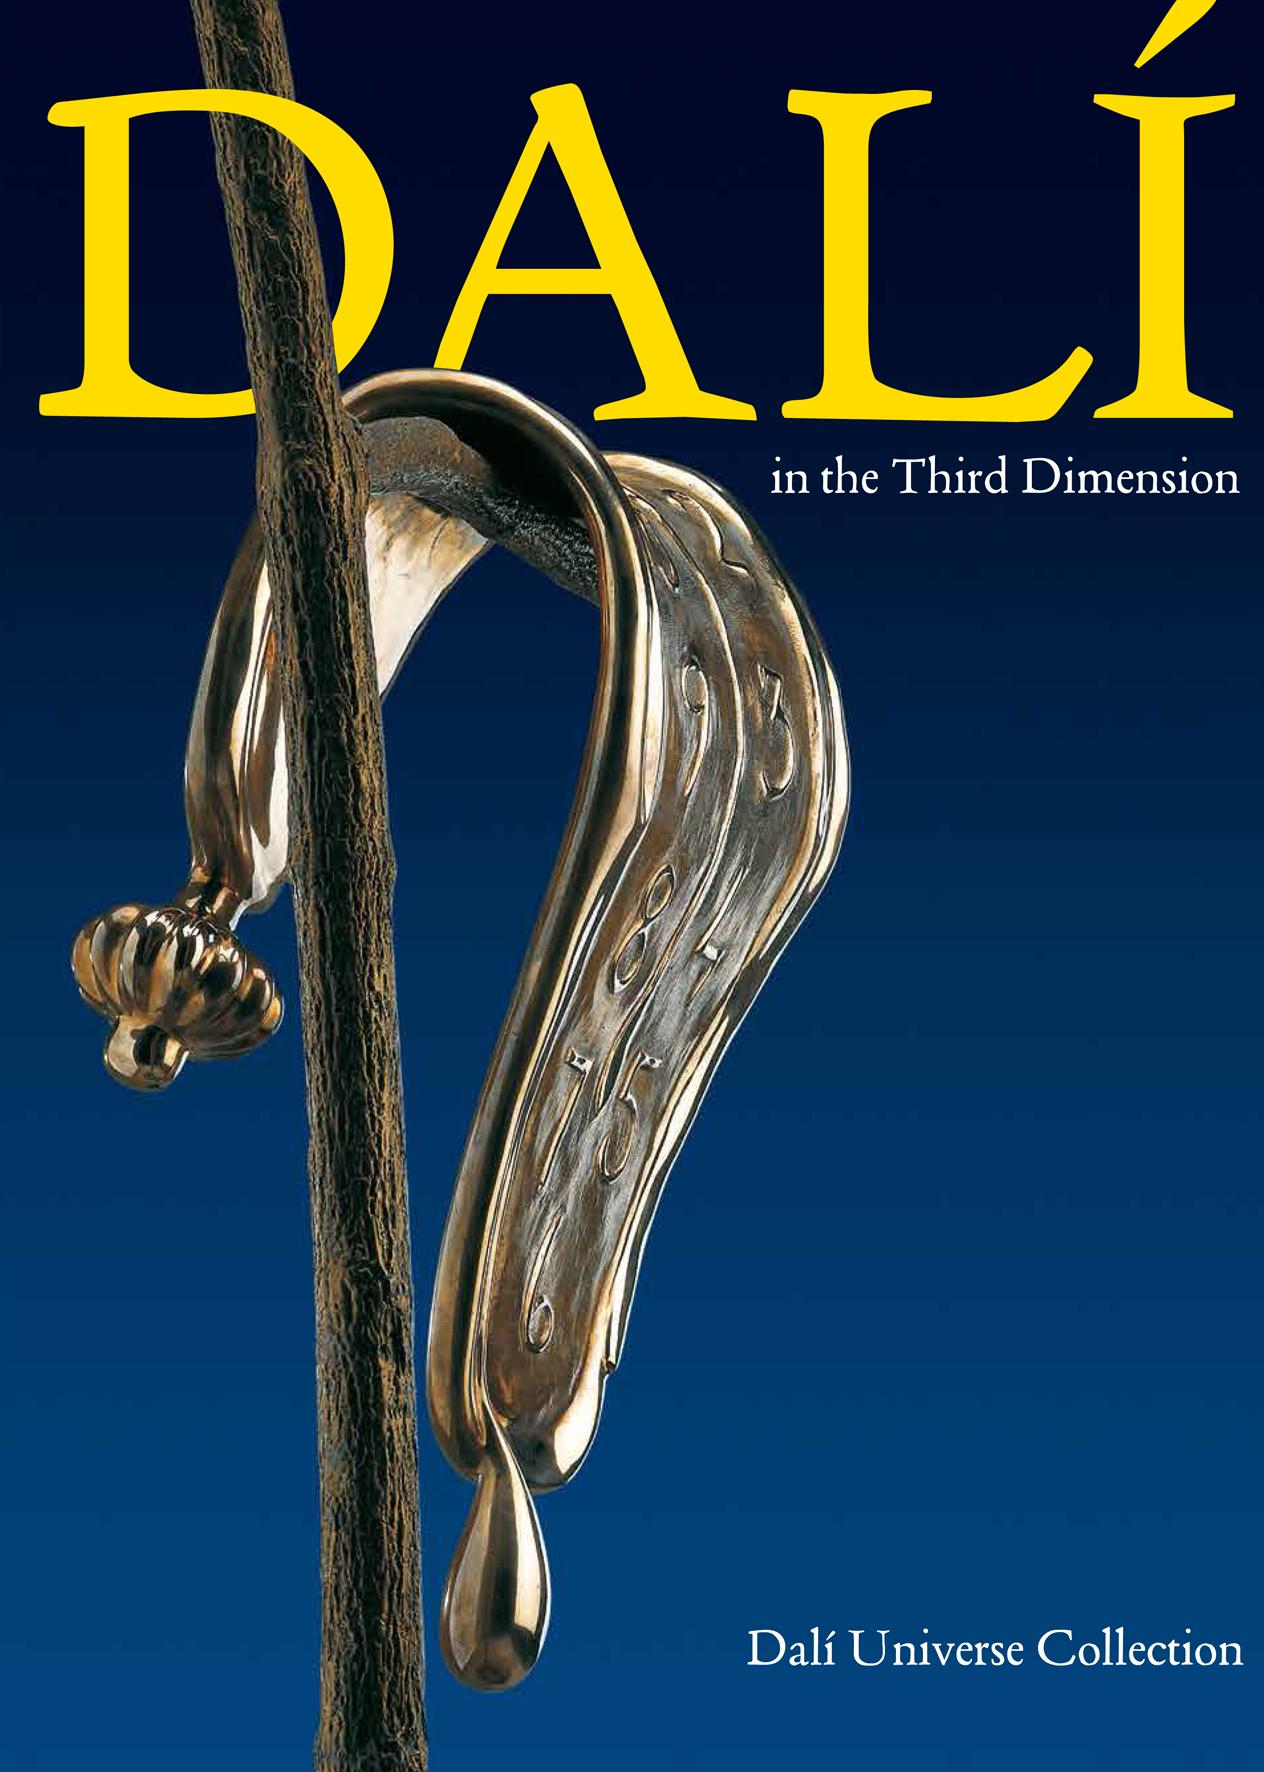 Dalí In The Third Dimesion 2010 Alemandi Editore Torino